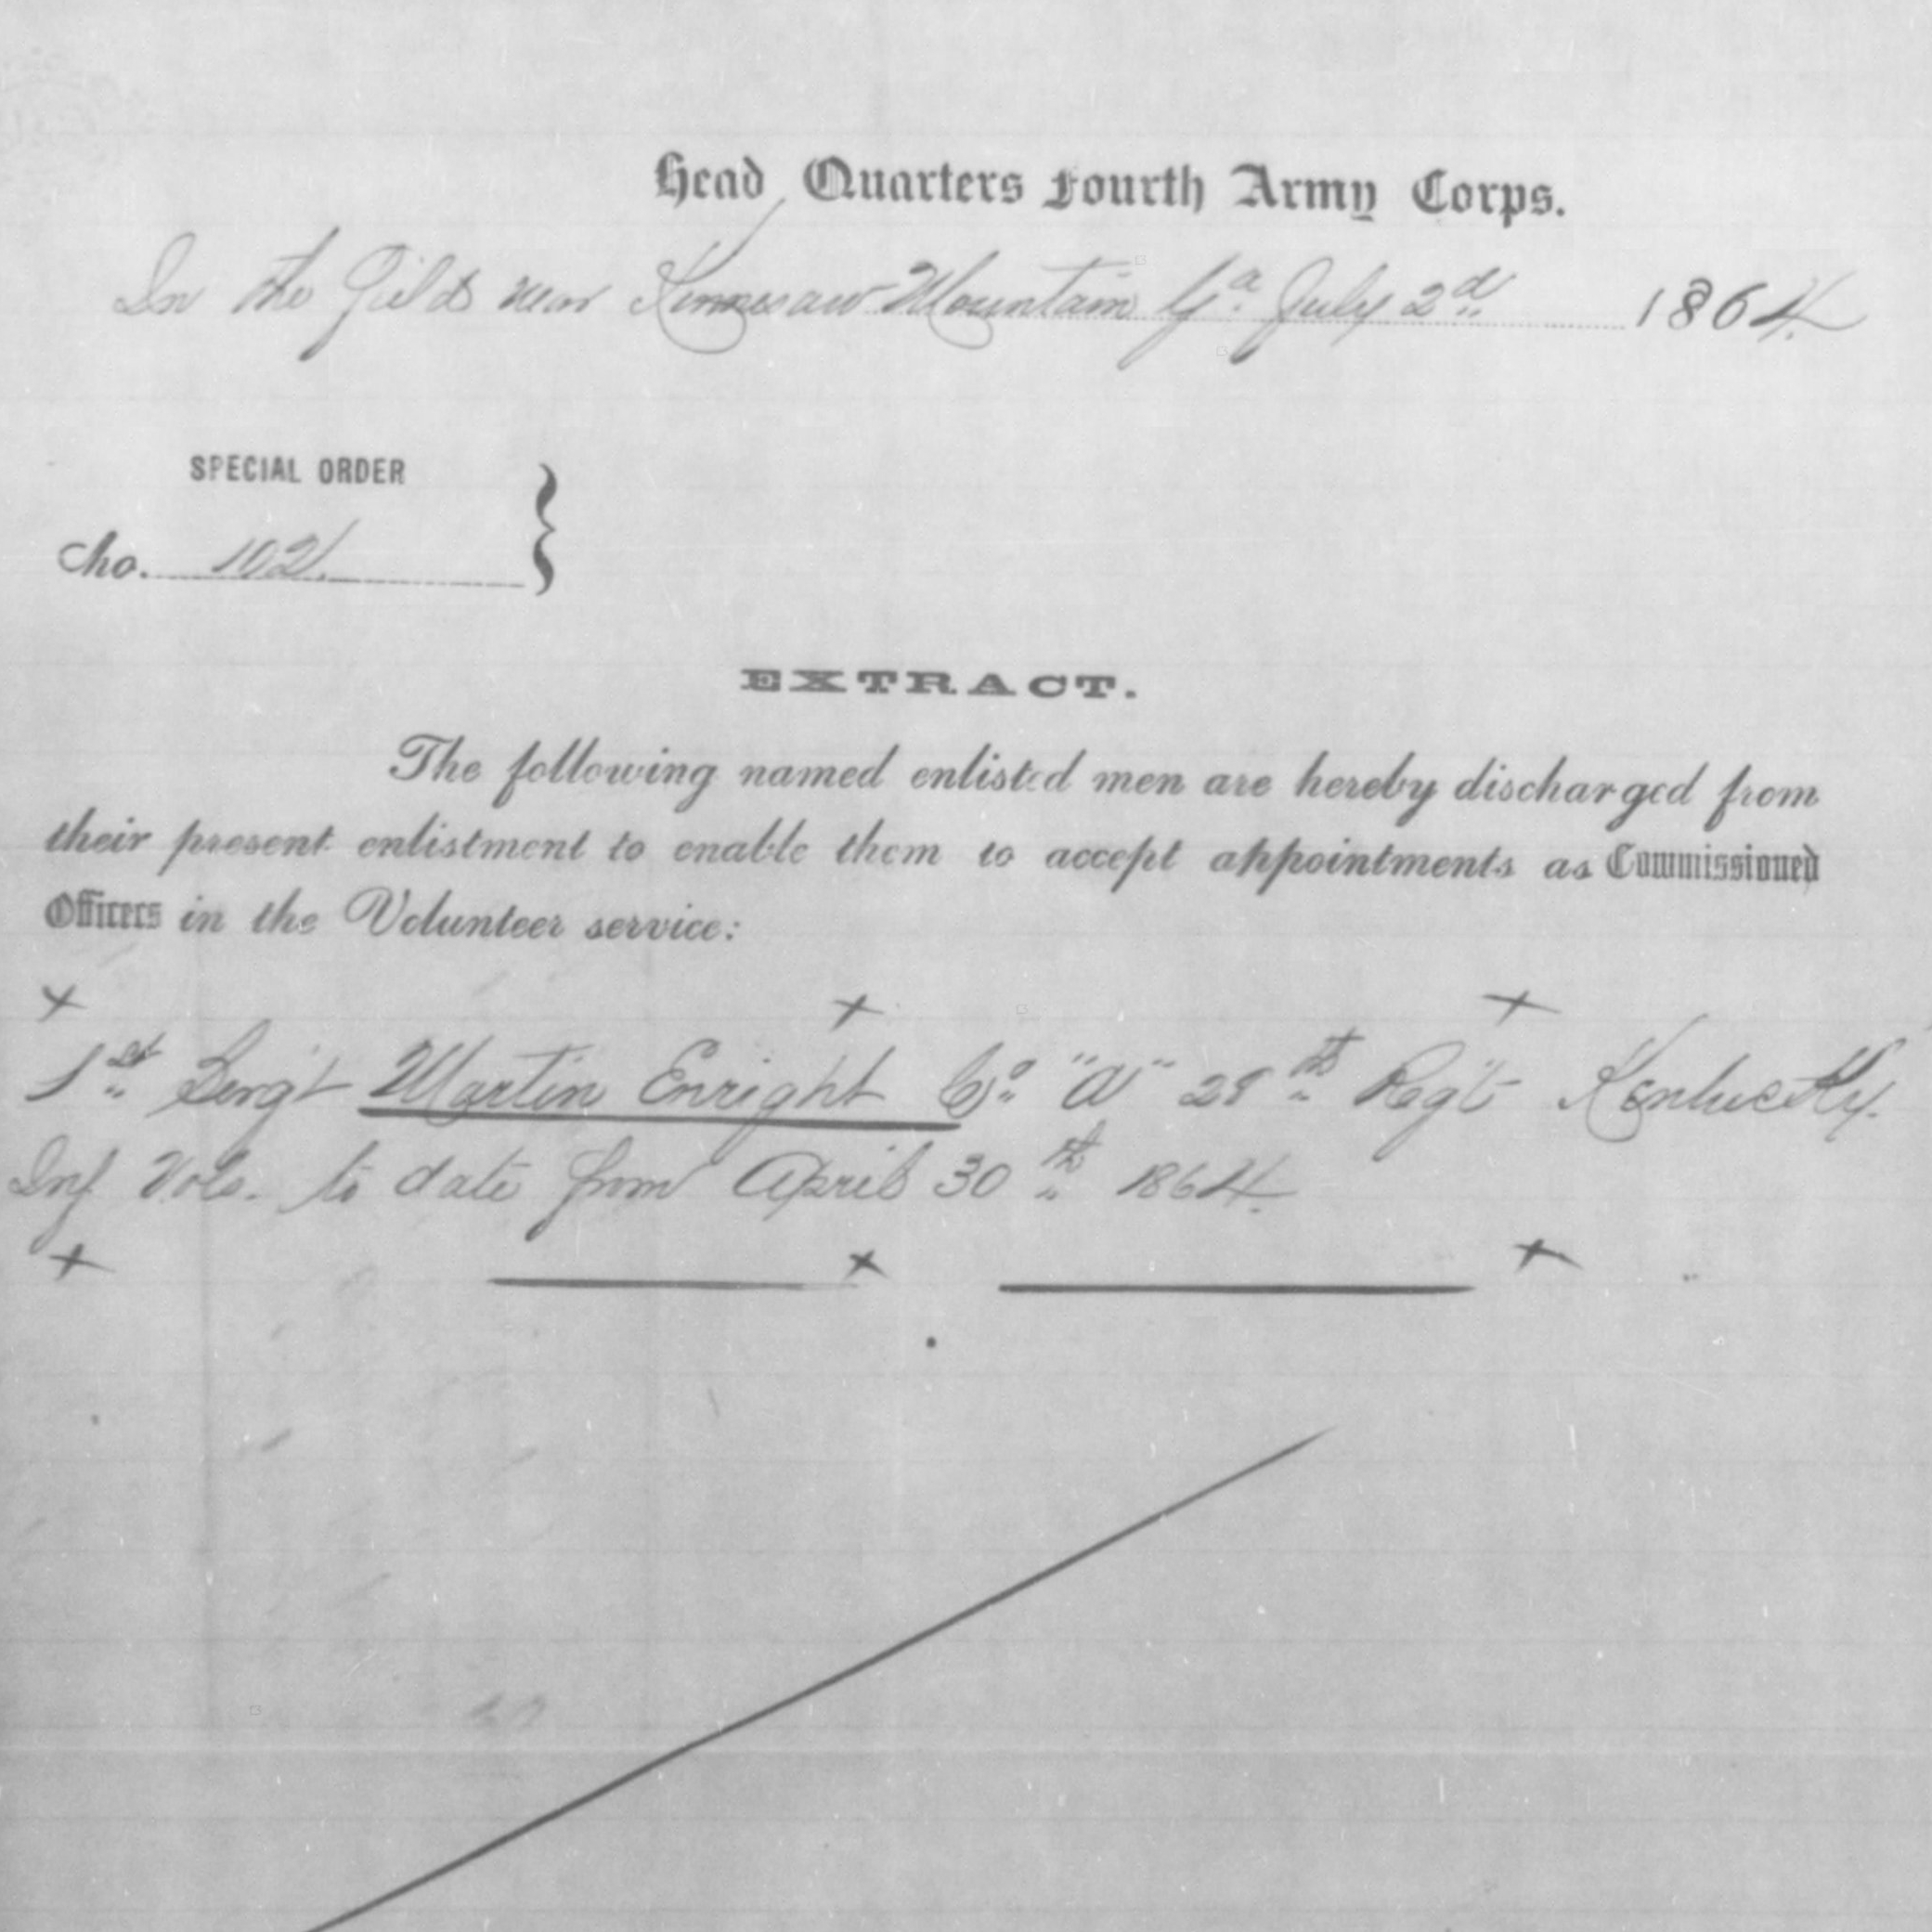 Capt. Martin Enright, Co. A & B, 28th KY Infantry, USA